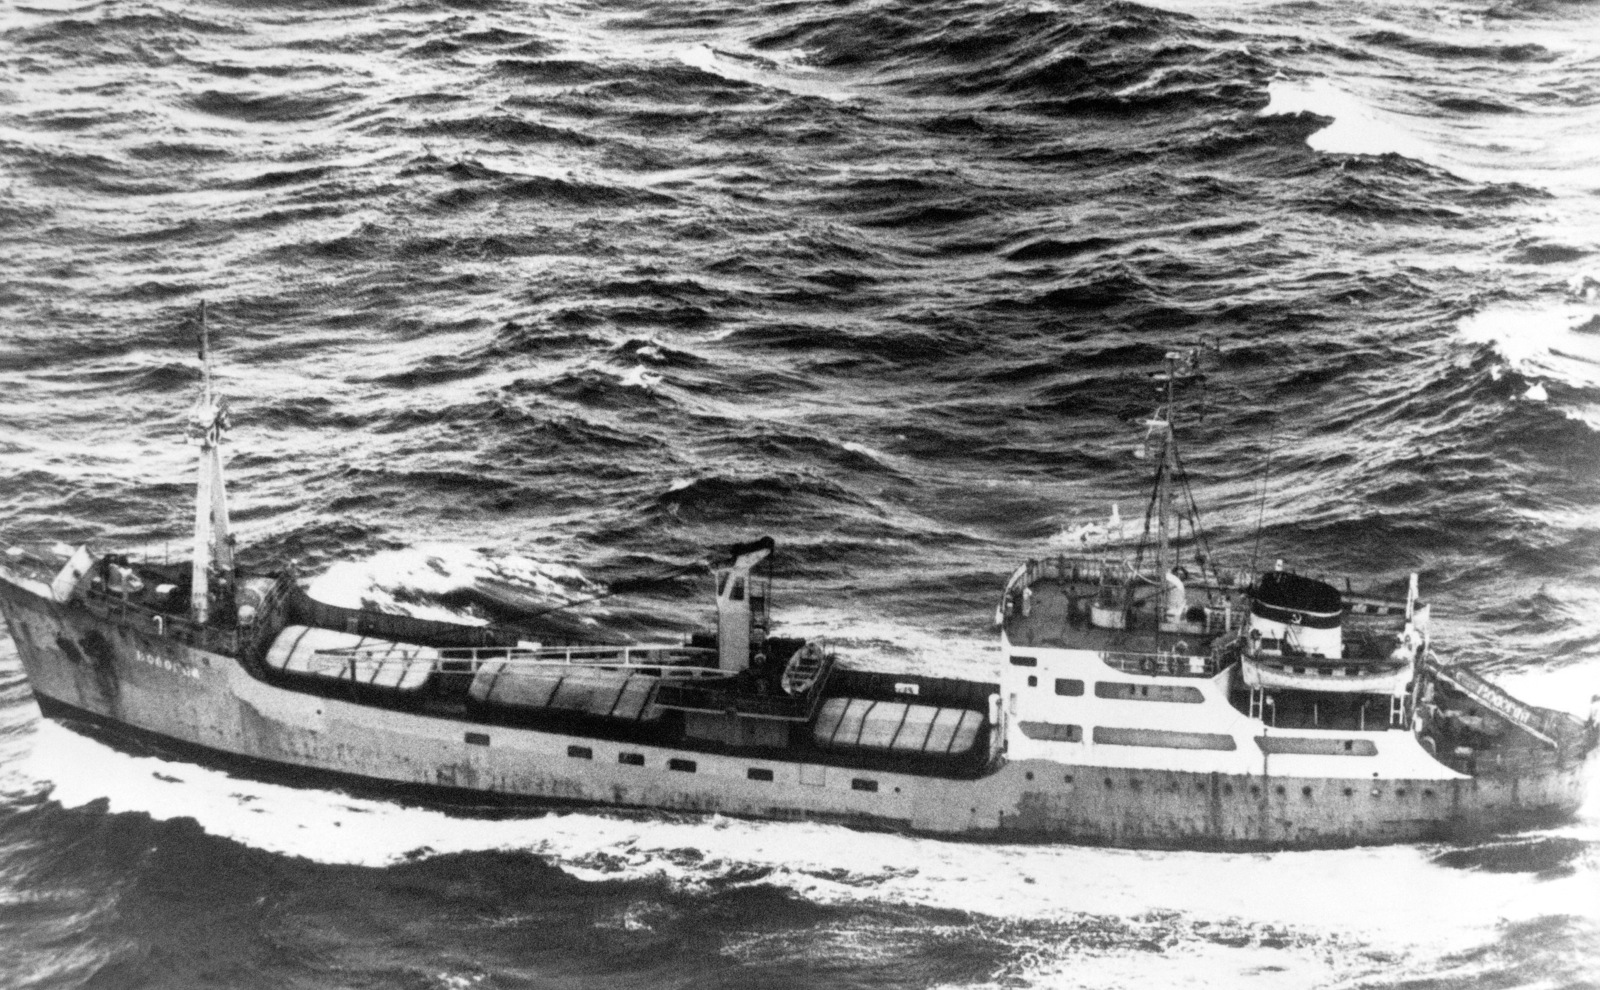 Aerial port beam view of a Soviet MP-6 class cargo ship underway